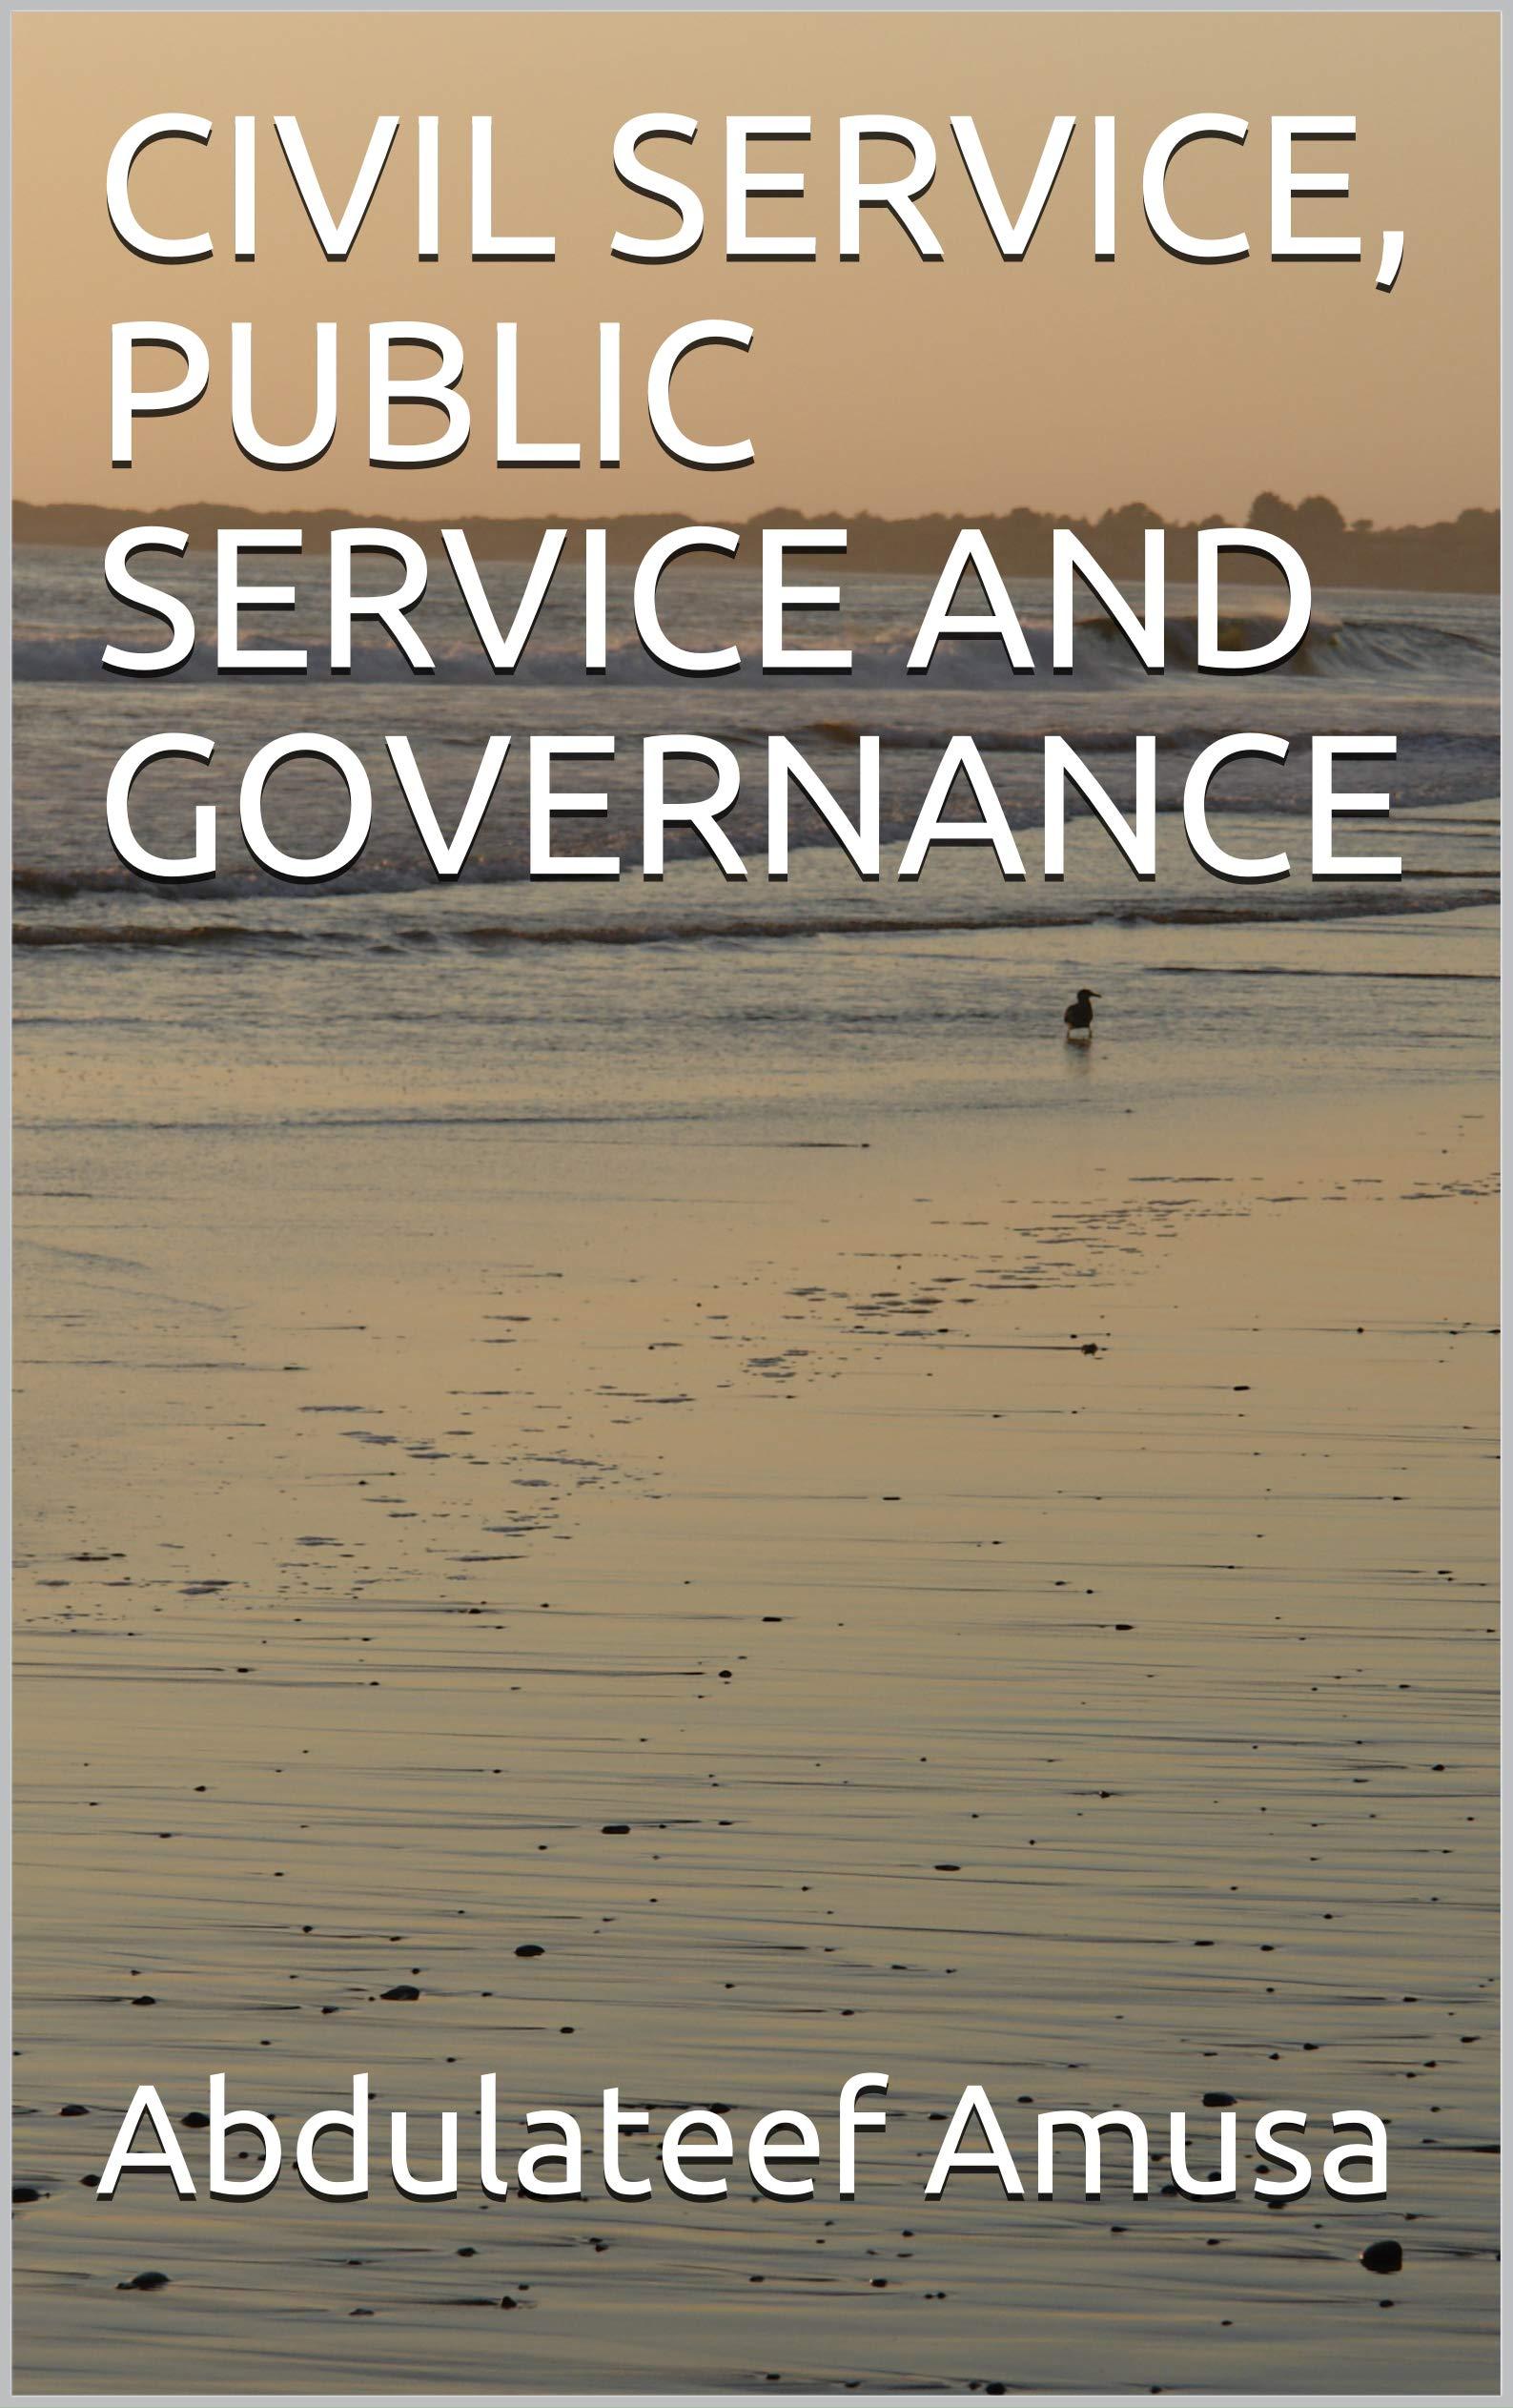 CIVIL SERVICE, PUBLIC SERVICE AND GOVERNANCE